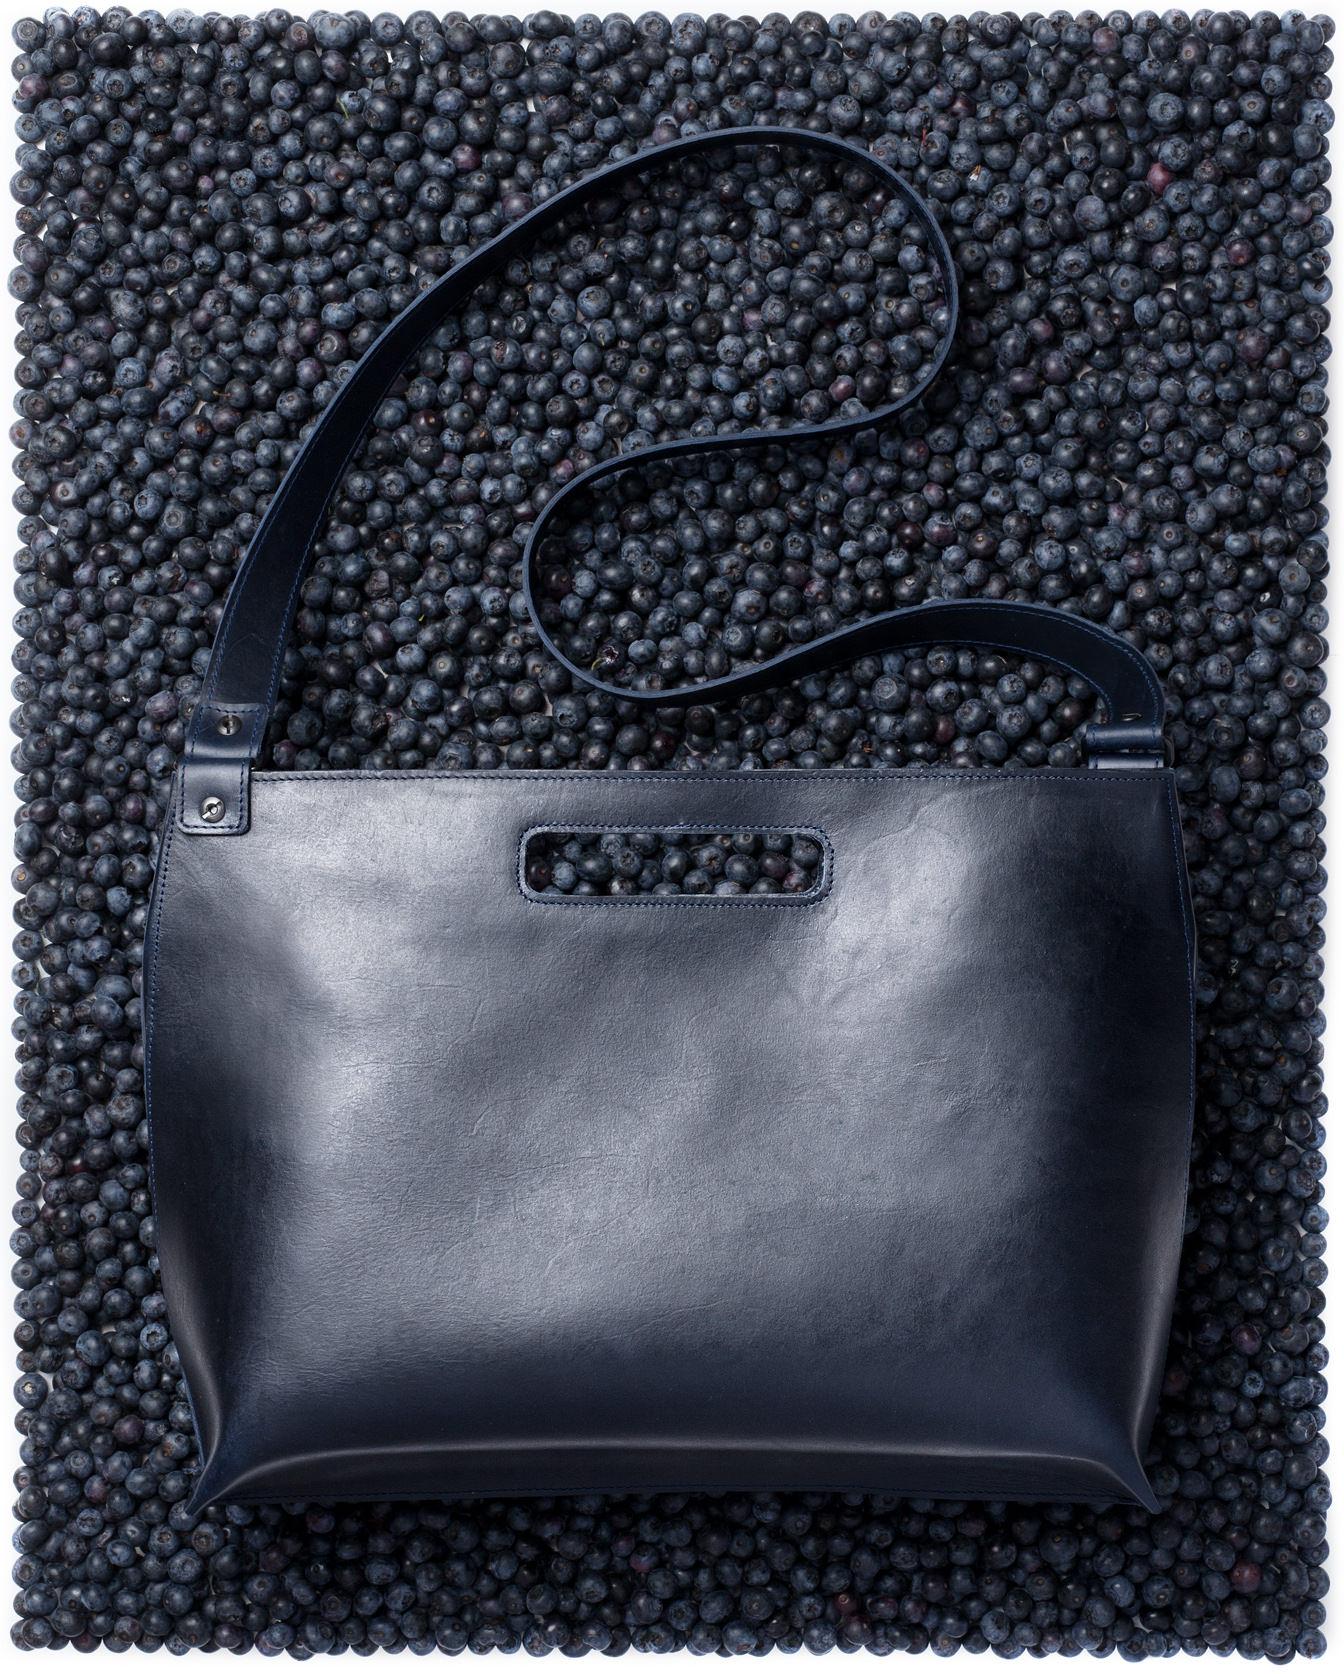 Stella_Soomlais_bluberry_leather_handbag_photo_Altrov_